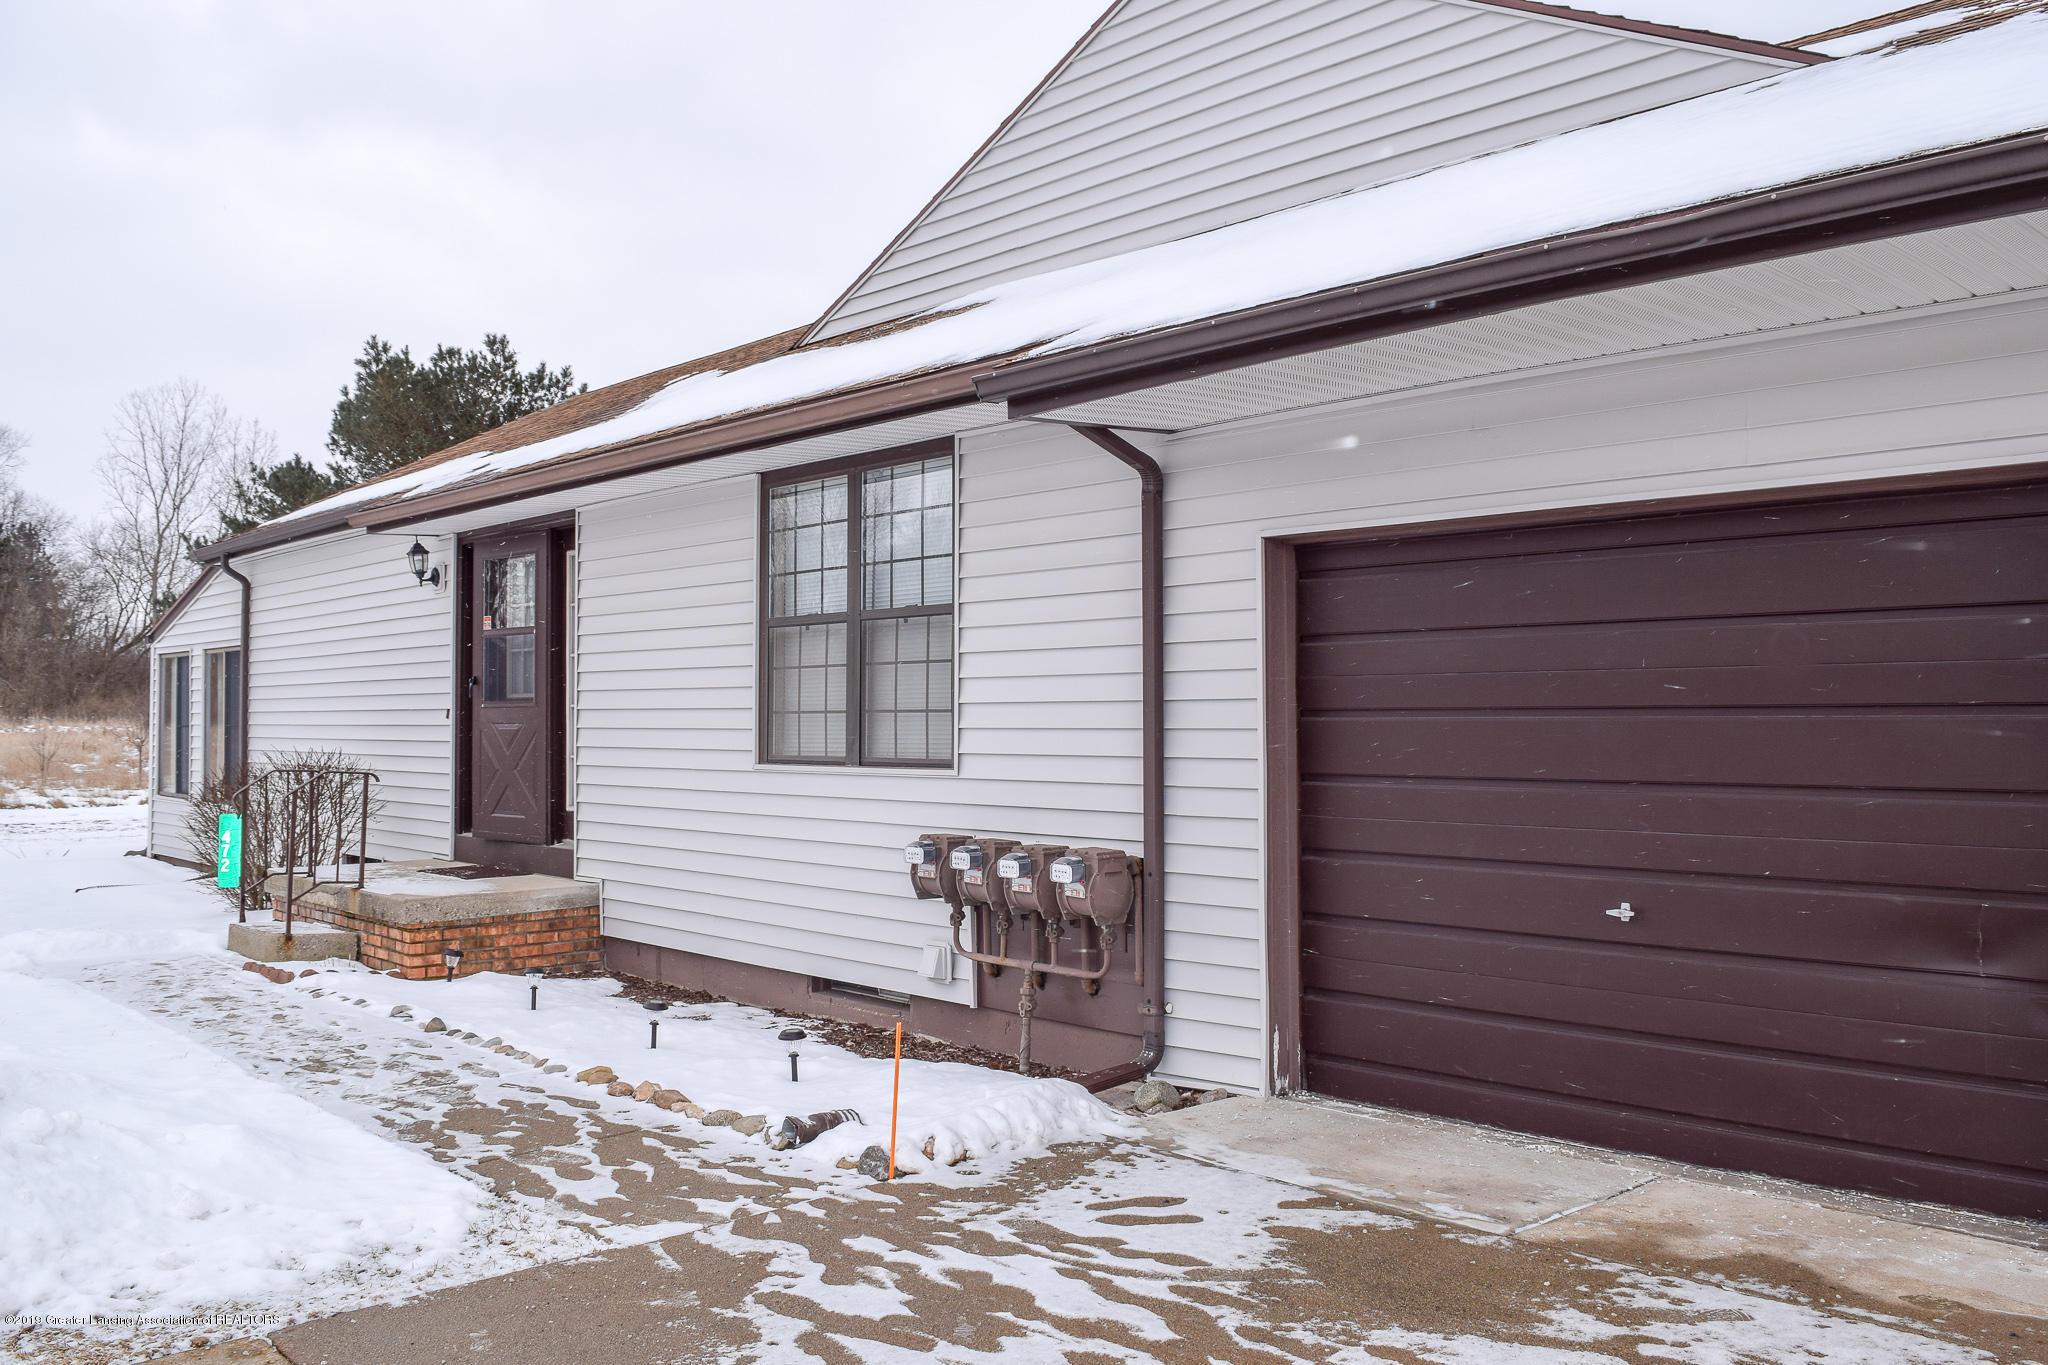 472 Red Cedar Blvd 1 - Ext. Front - 1